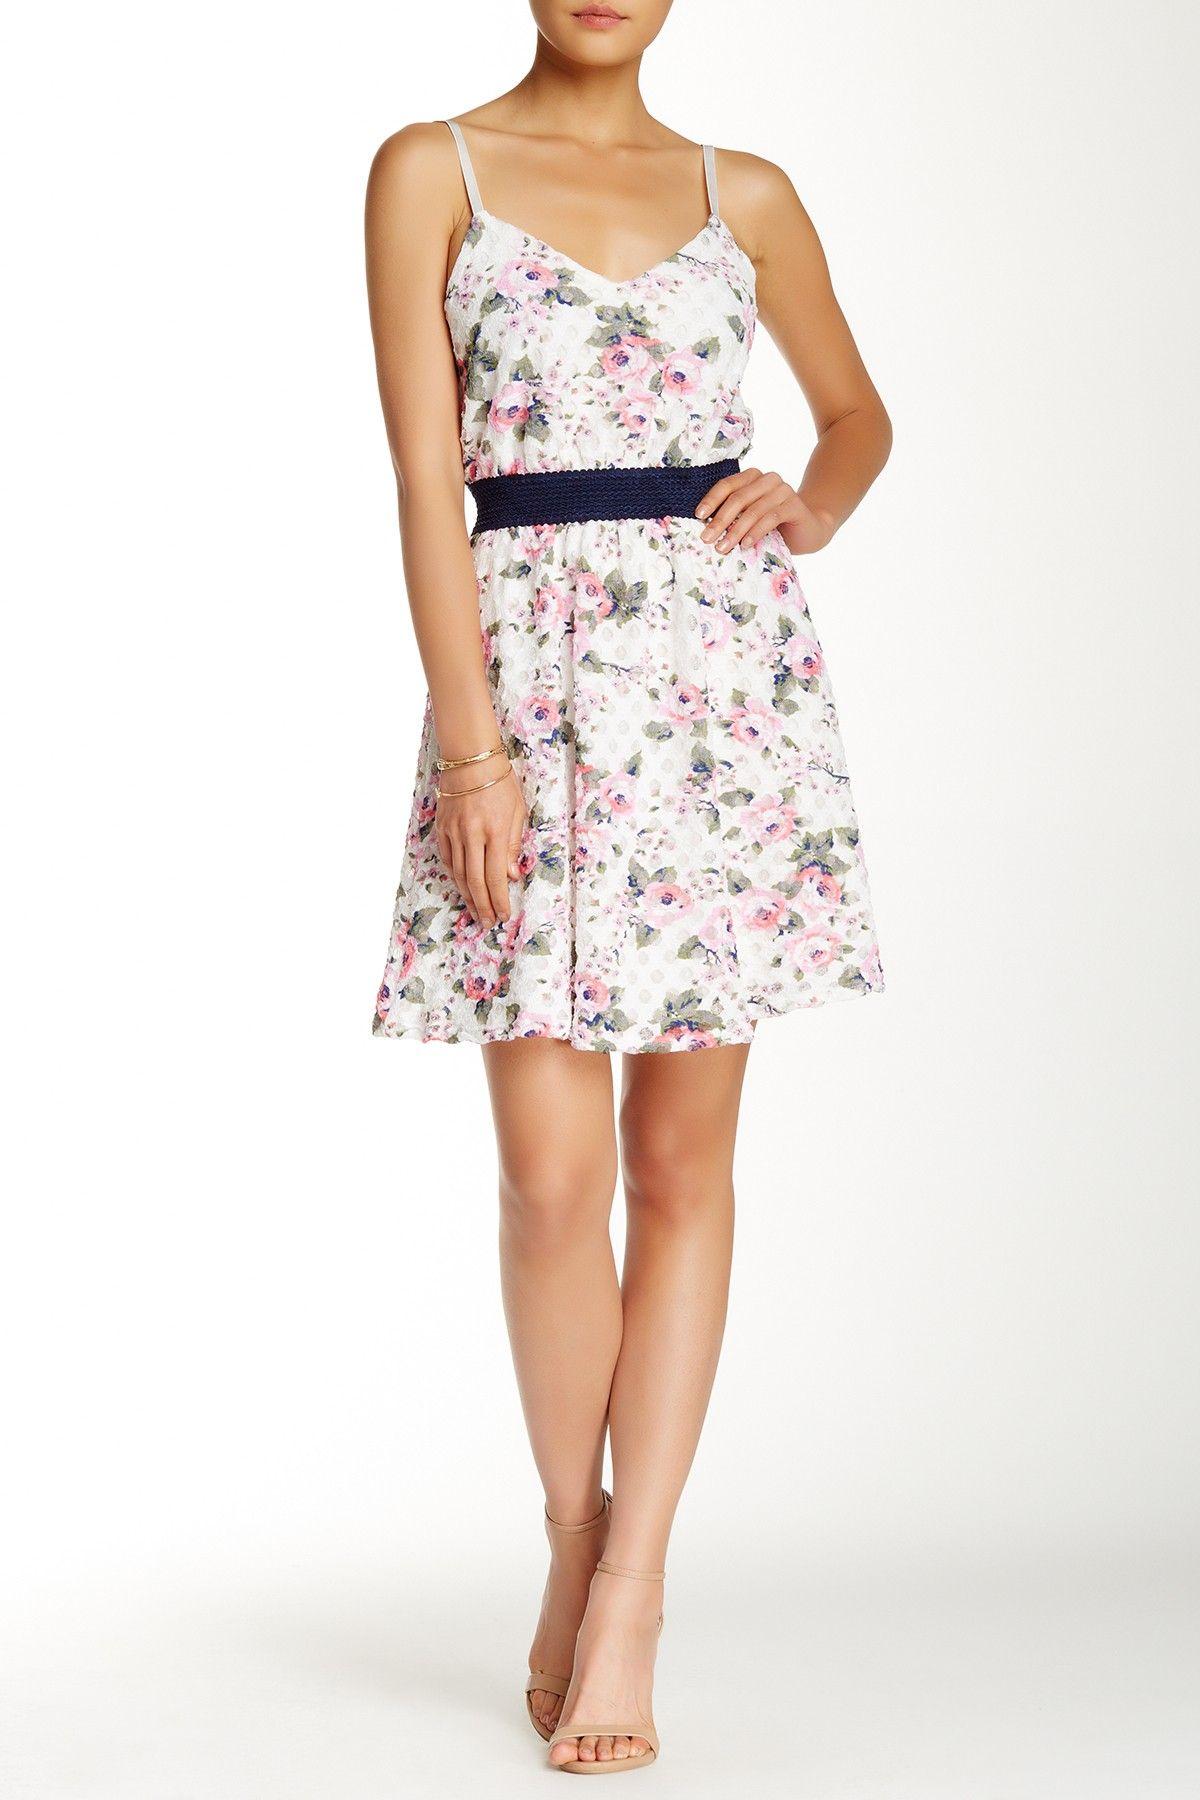 Lace Skater Dress Juniors Lace Skater Dress Dresses Junior Dresses [ 1800 x 1200 Pixel ]